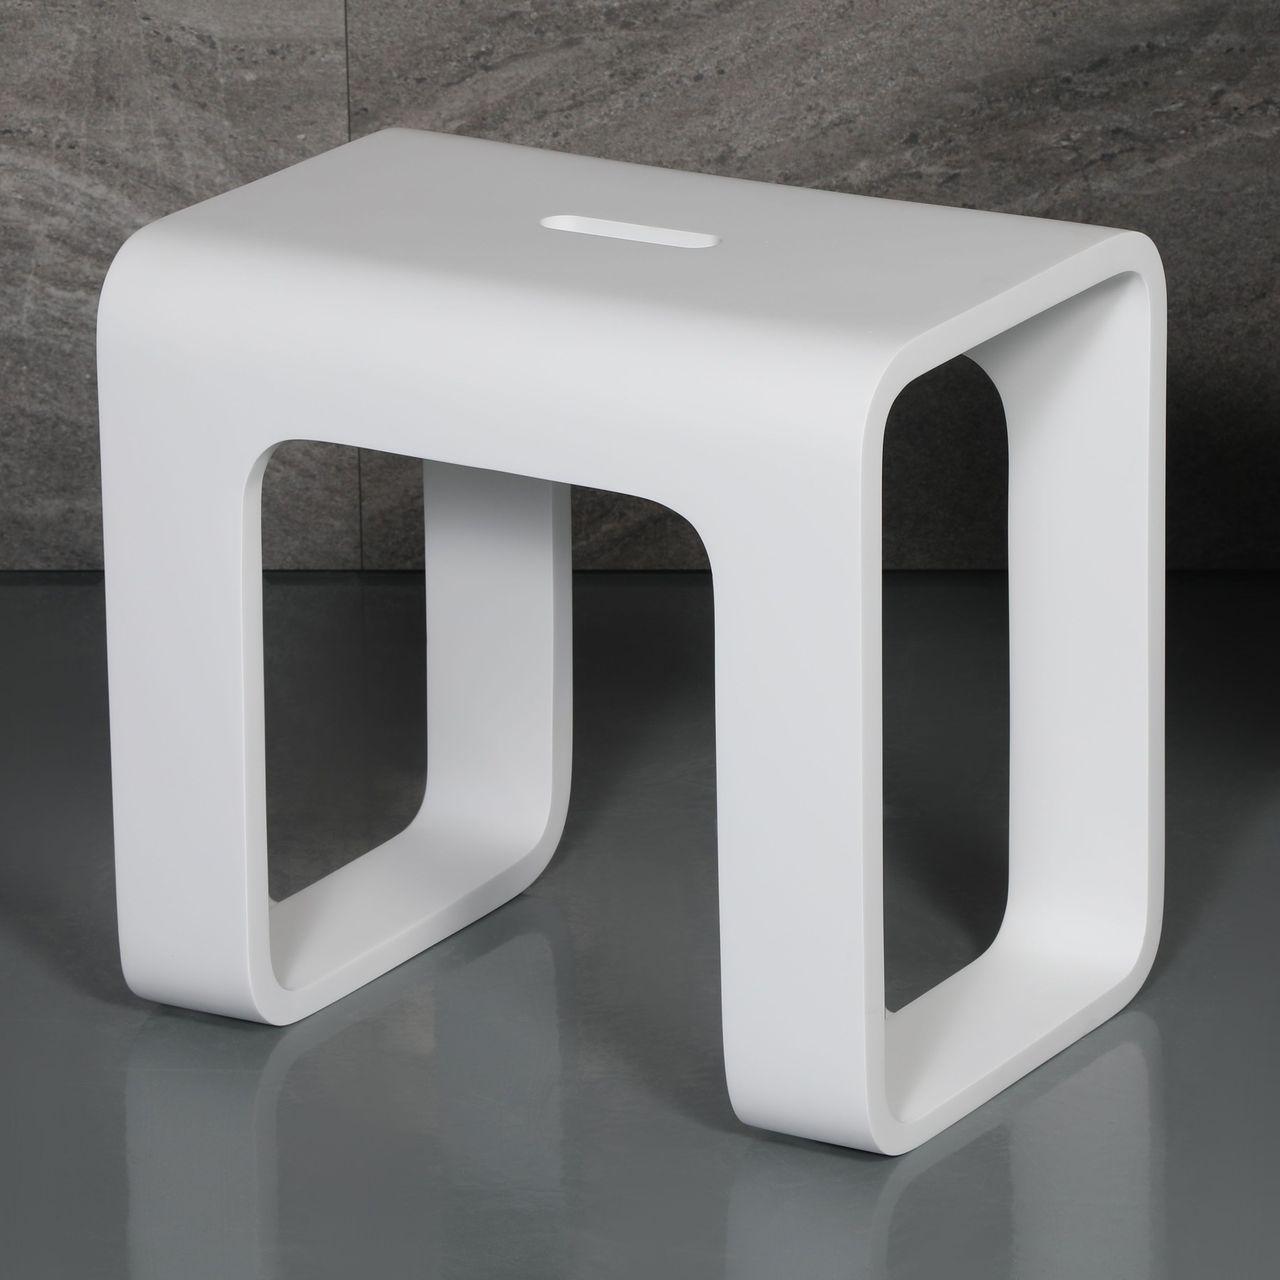 ALFI White Matte Solid Surface Resin Bathroom / Shower Stool